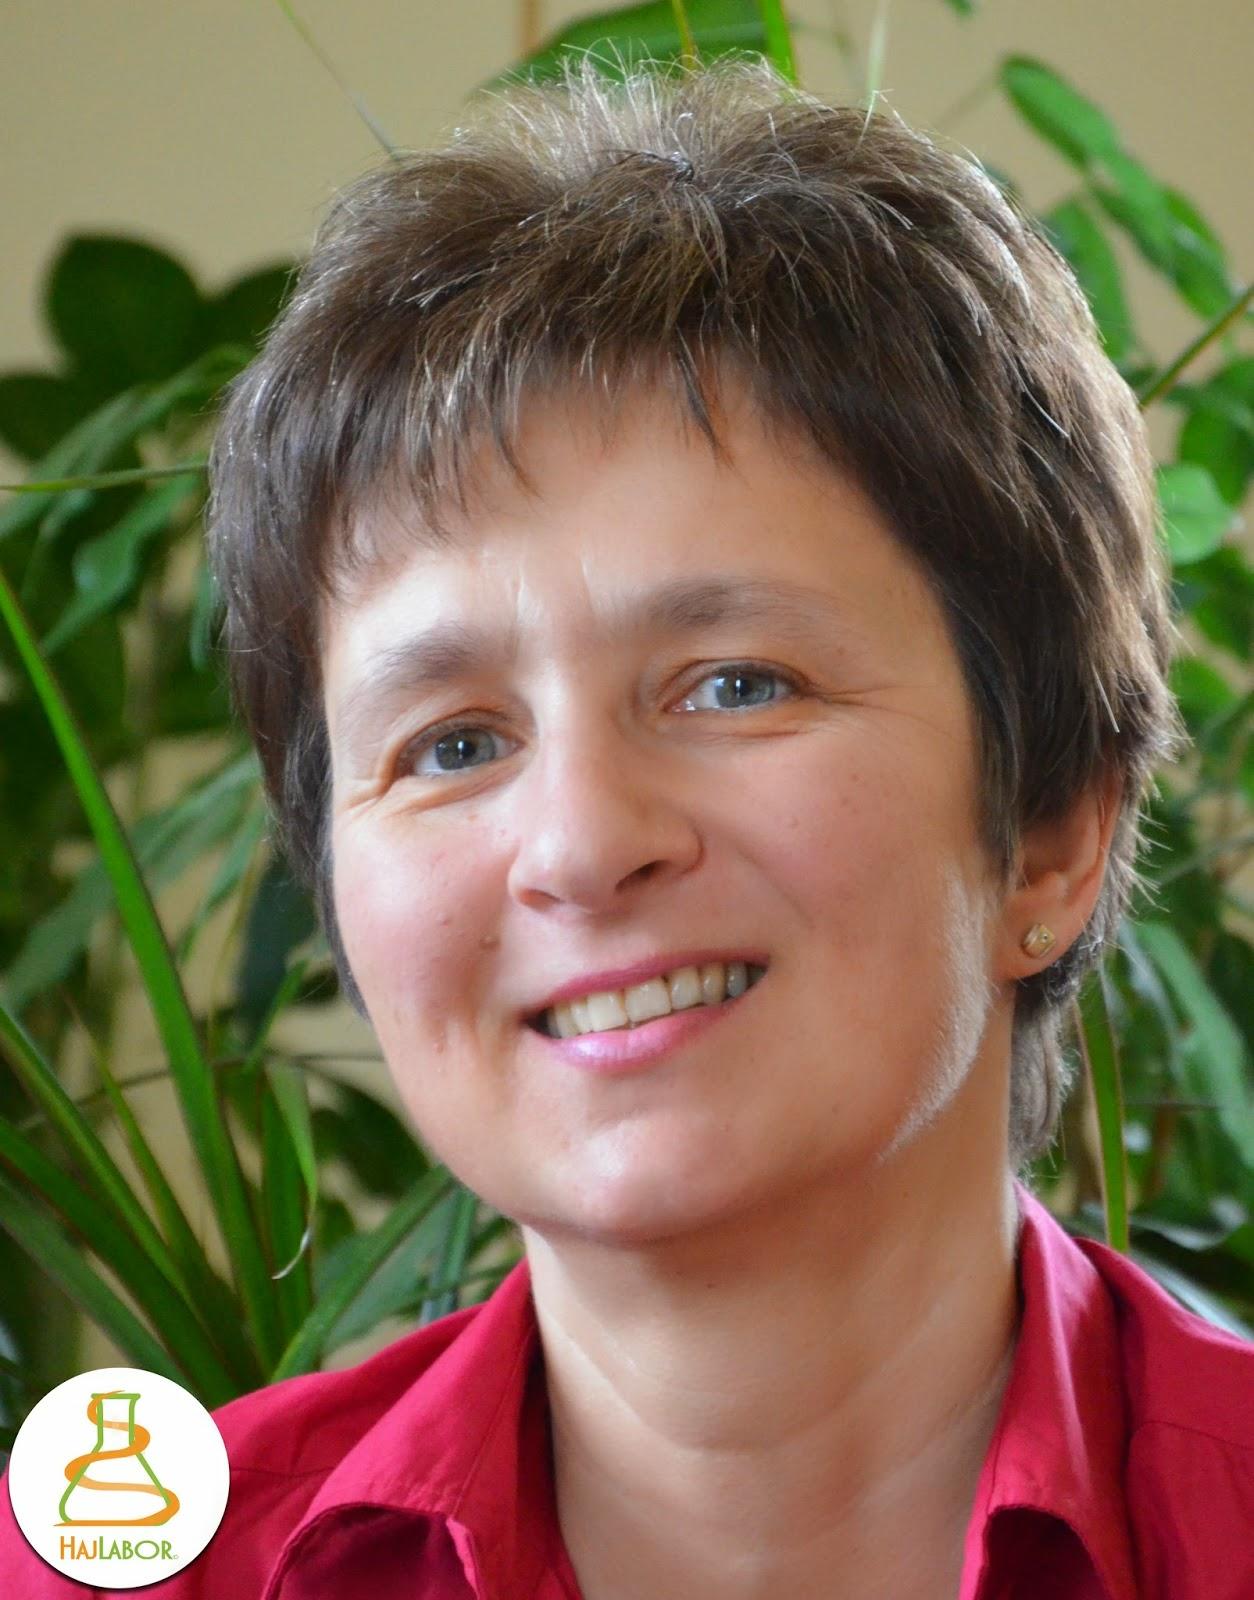 Dr. Jónás Eszter, Hajlabor, homeopátia, homeopata, komplementer medicina